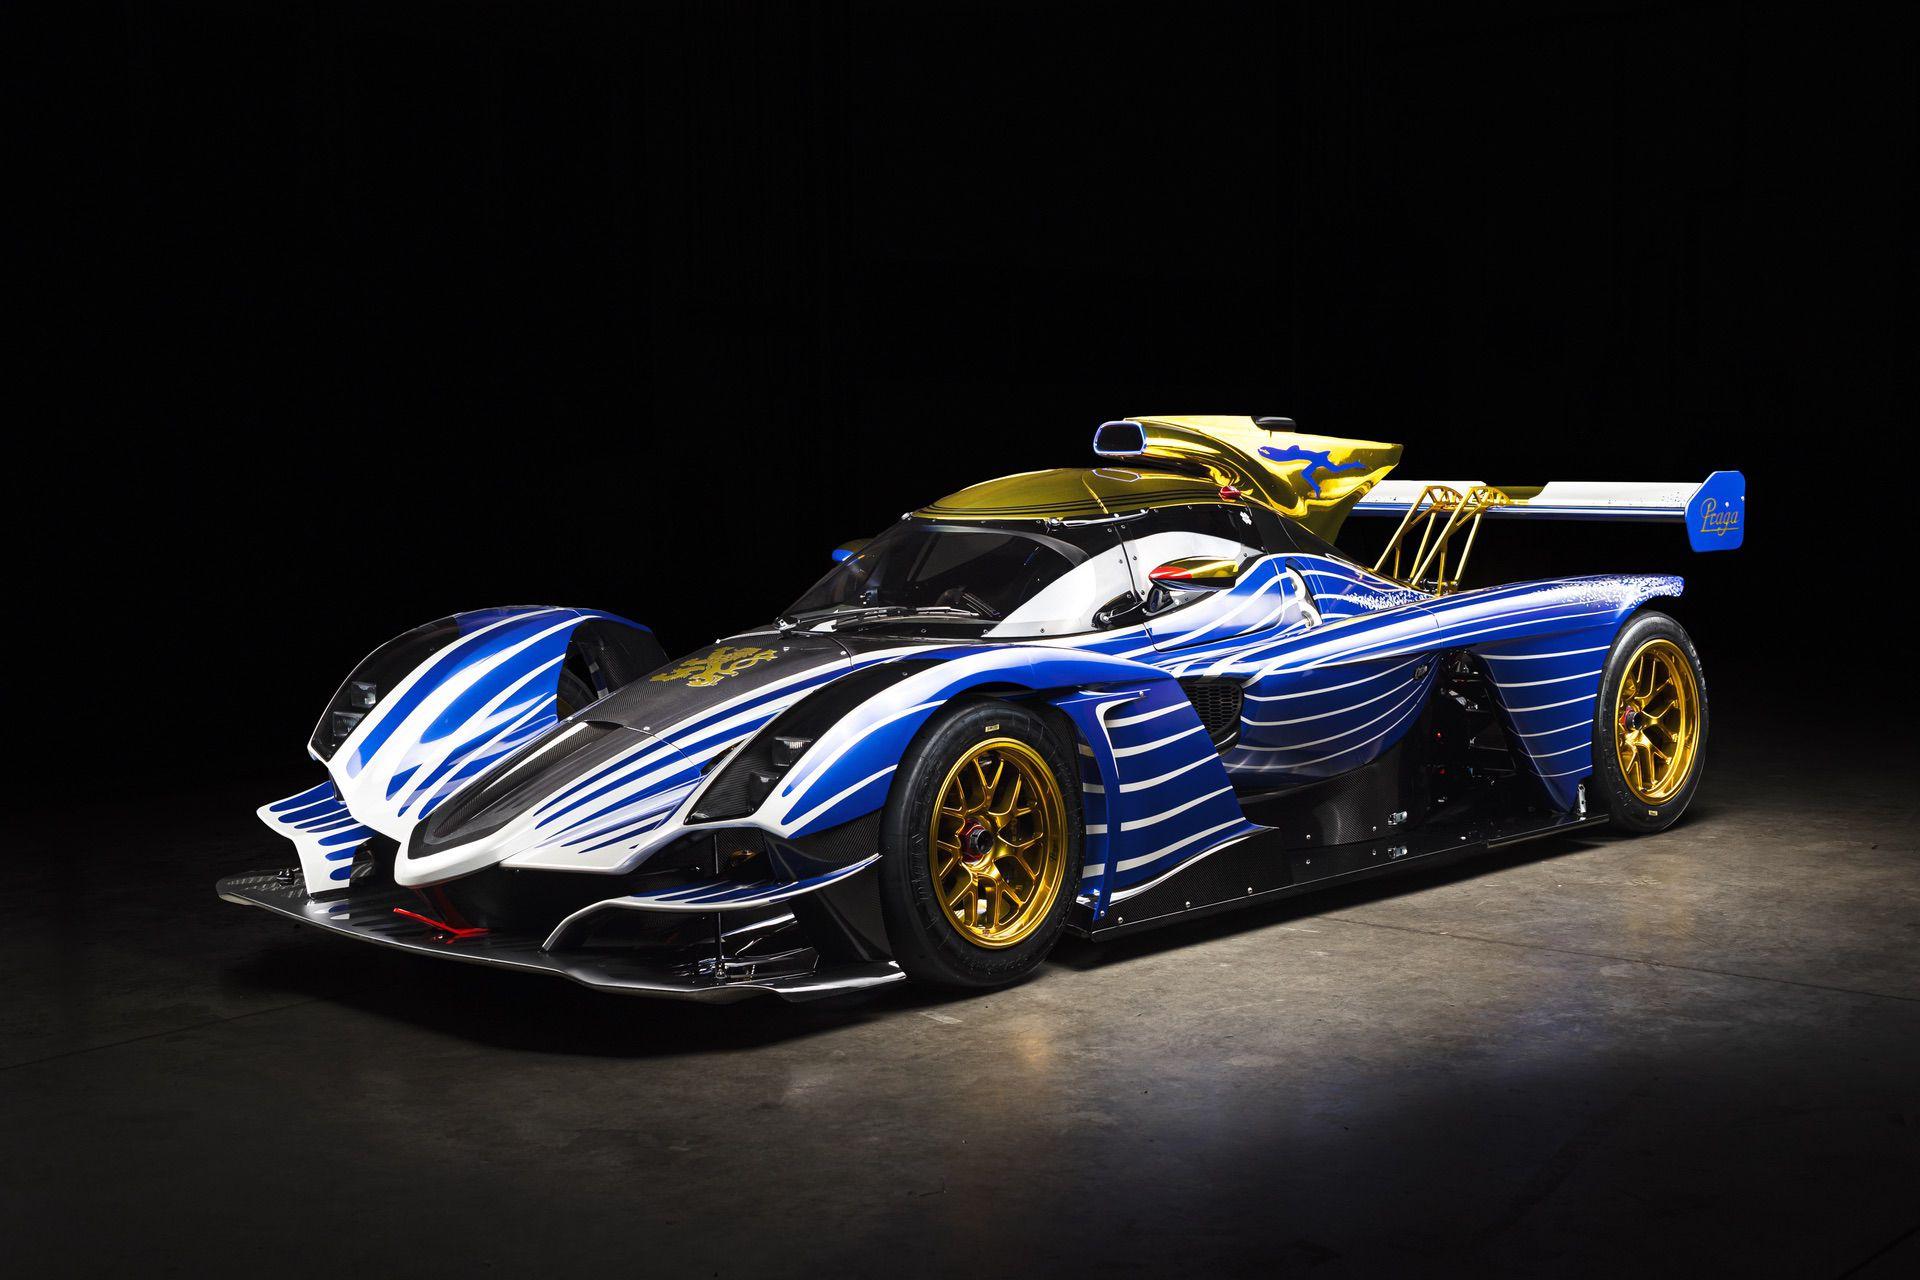 Praga_R1_Frank_Stephenson_racing_livery-0018